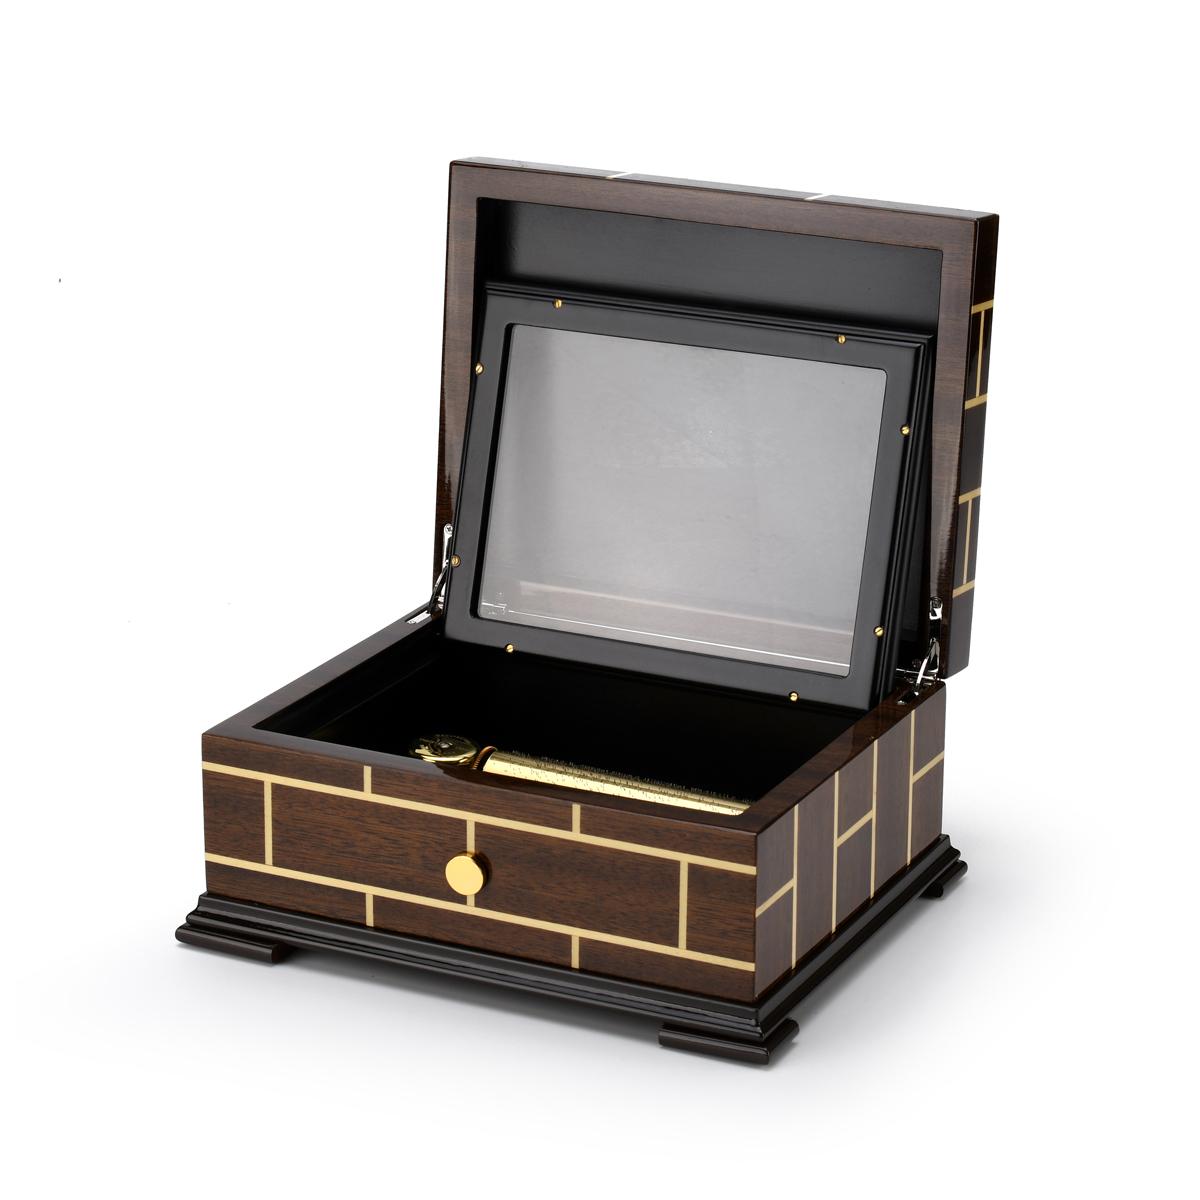 Brilliant Wood Tone Modern Masonry Design 50 Note Sankyo Music Box HUGE SPECIAL